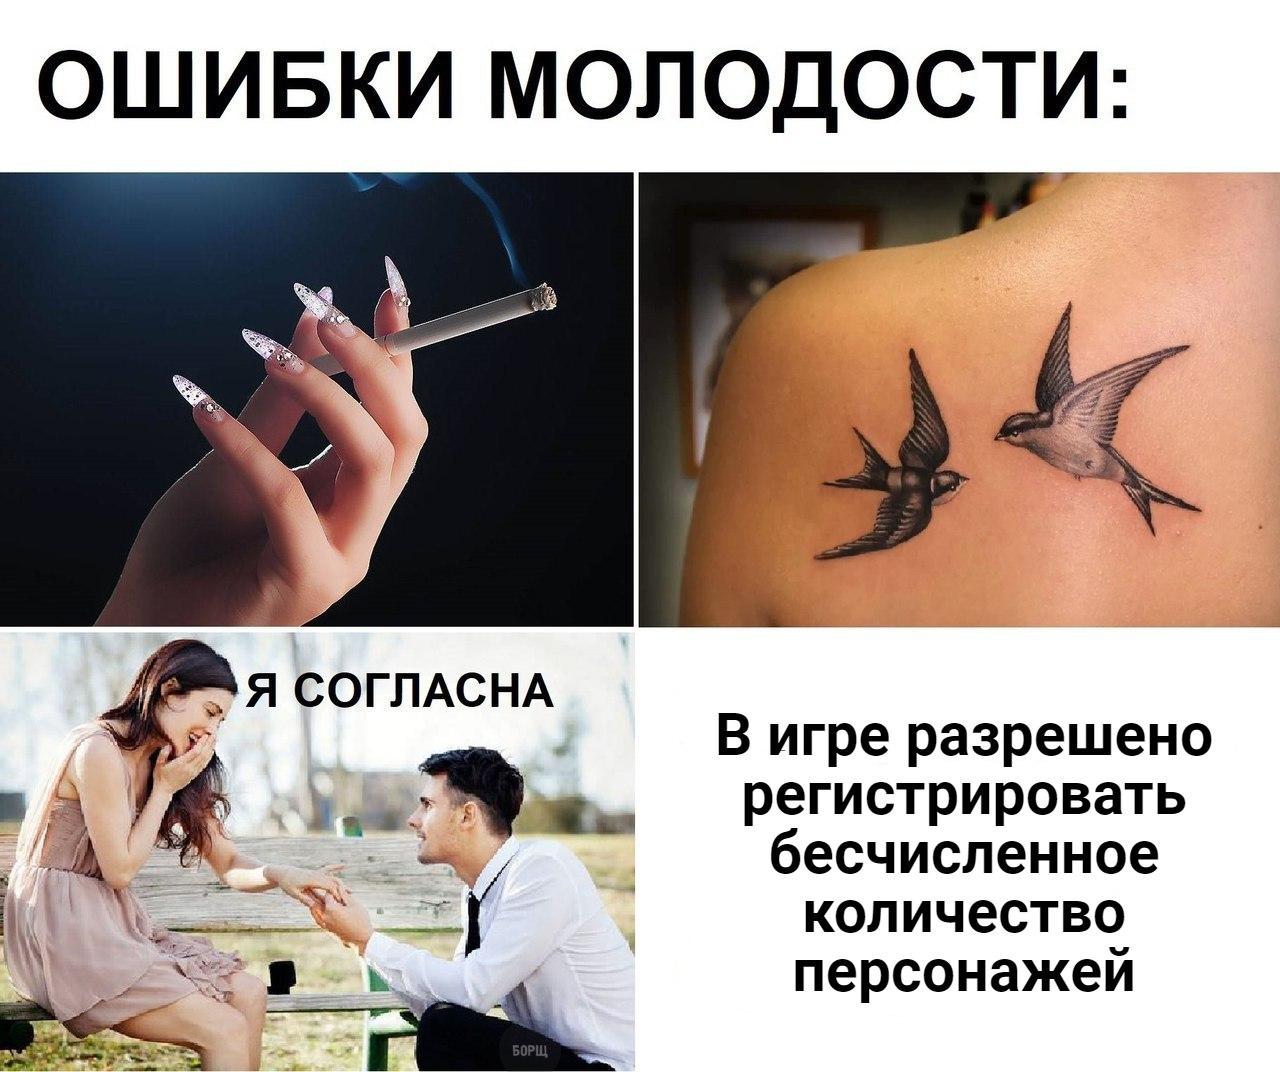 https://pp.userapi.com/c841033/v841033469/6d552/O6jW0f2K1Bs.jpg